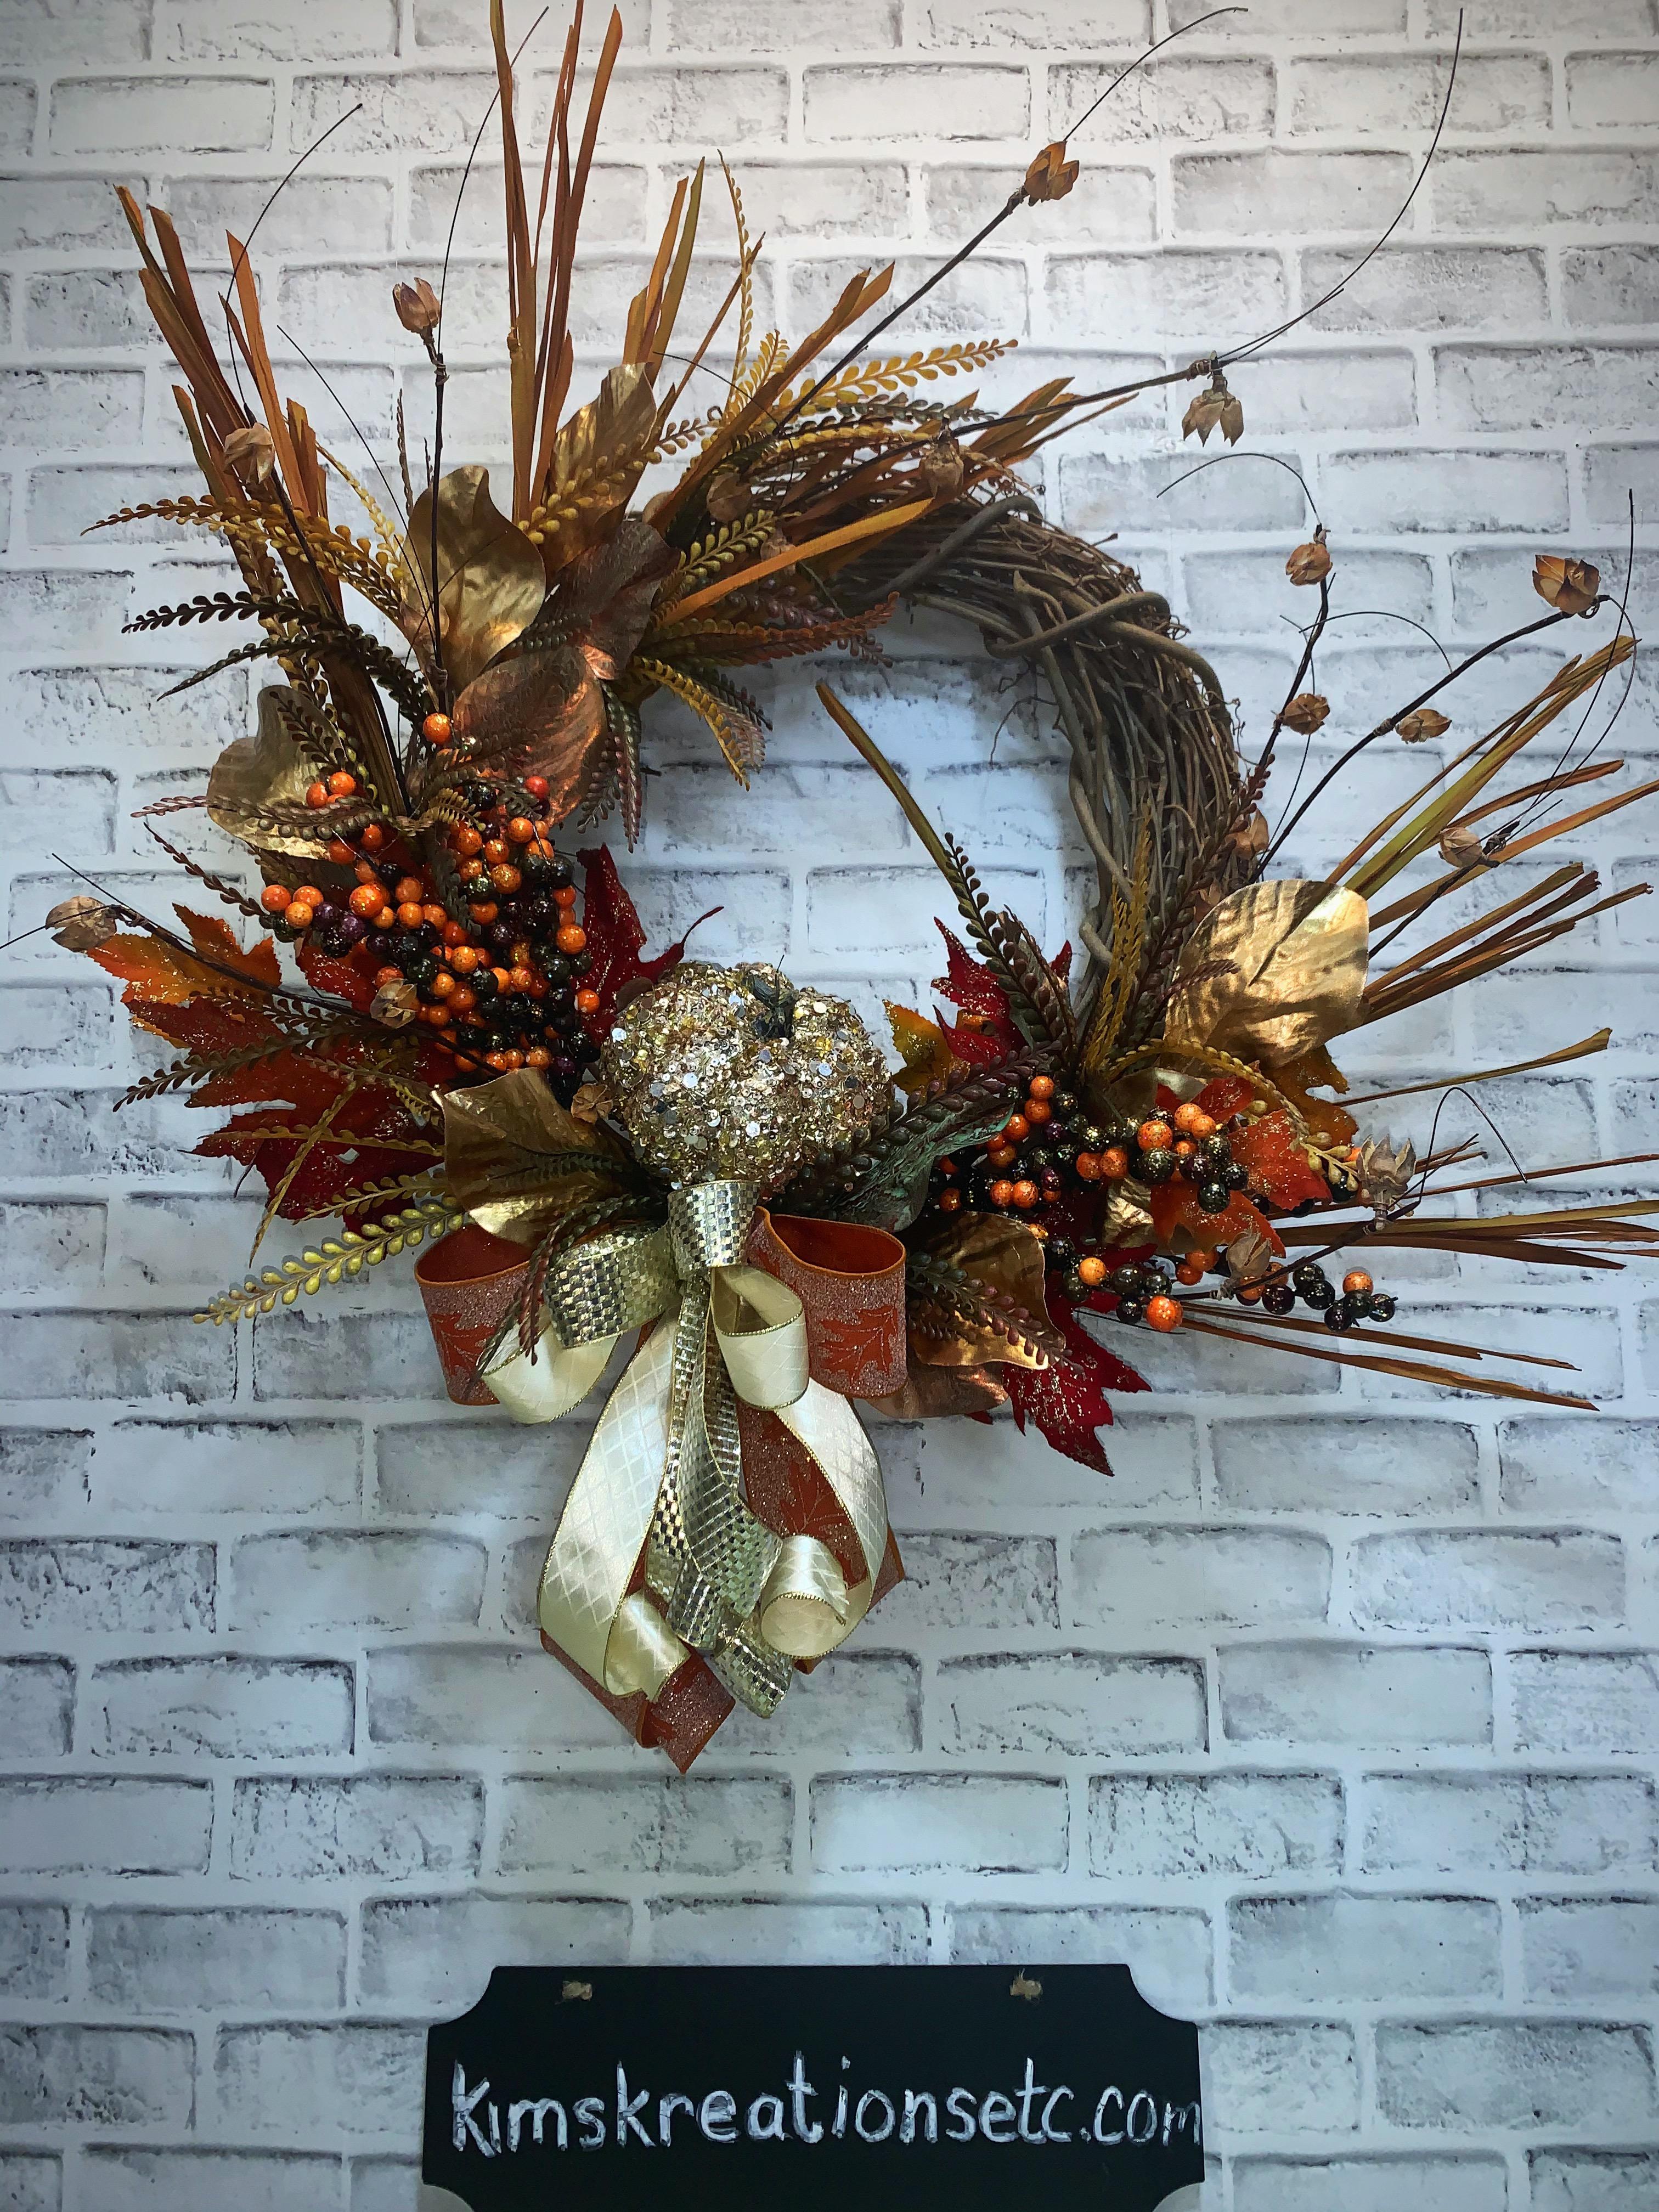 Fall Wreath Free Shipping Fall Door Wreath Fall Decorative Wreath Rustic Glam Fall Wreath Sequin Pumpkin Unique Fall Wreath Wreath For Fall Fall Decor Home Decor Handmade Wreaths Wreaths For Sale